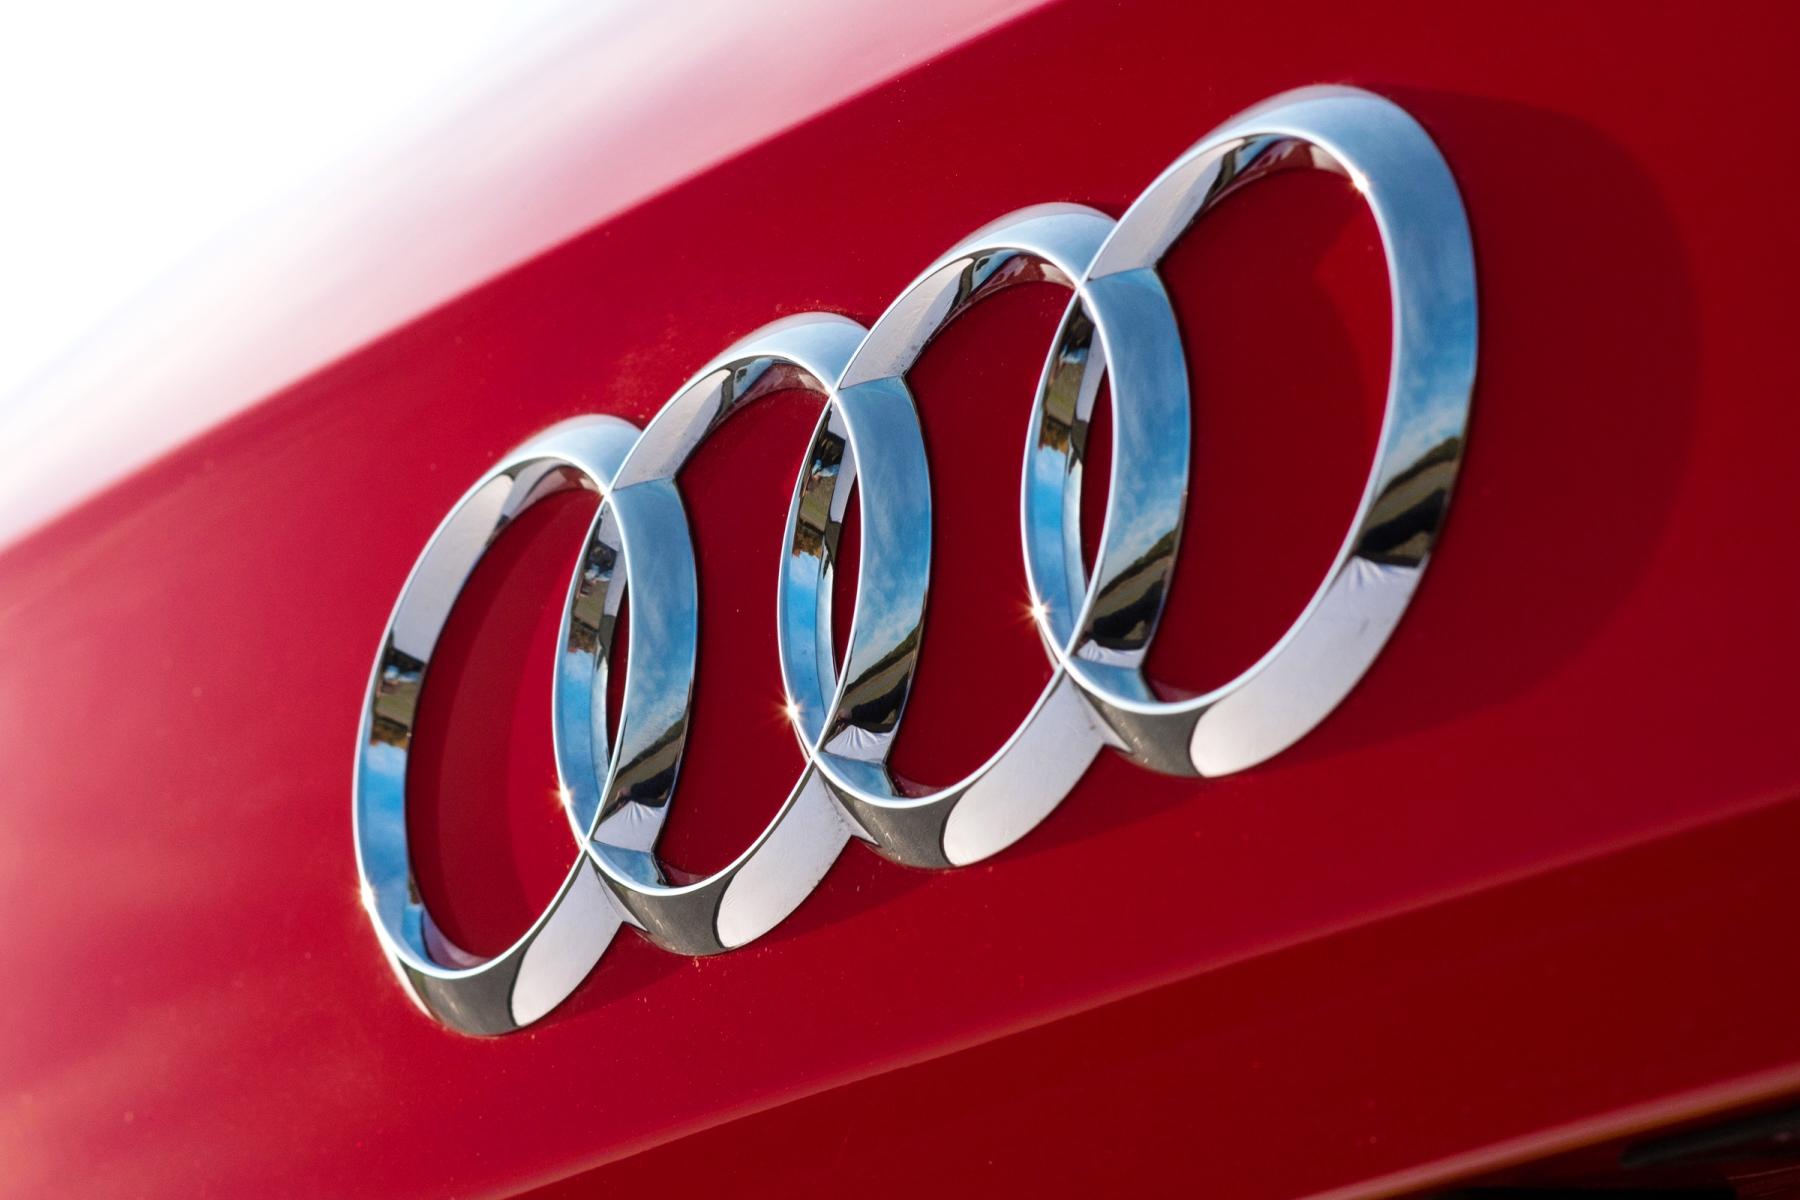 Audi four rings logo